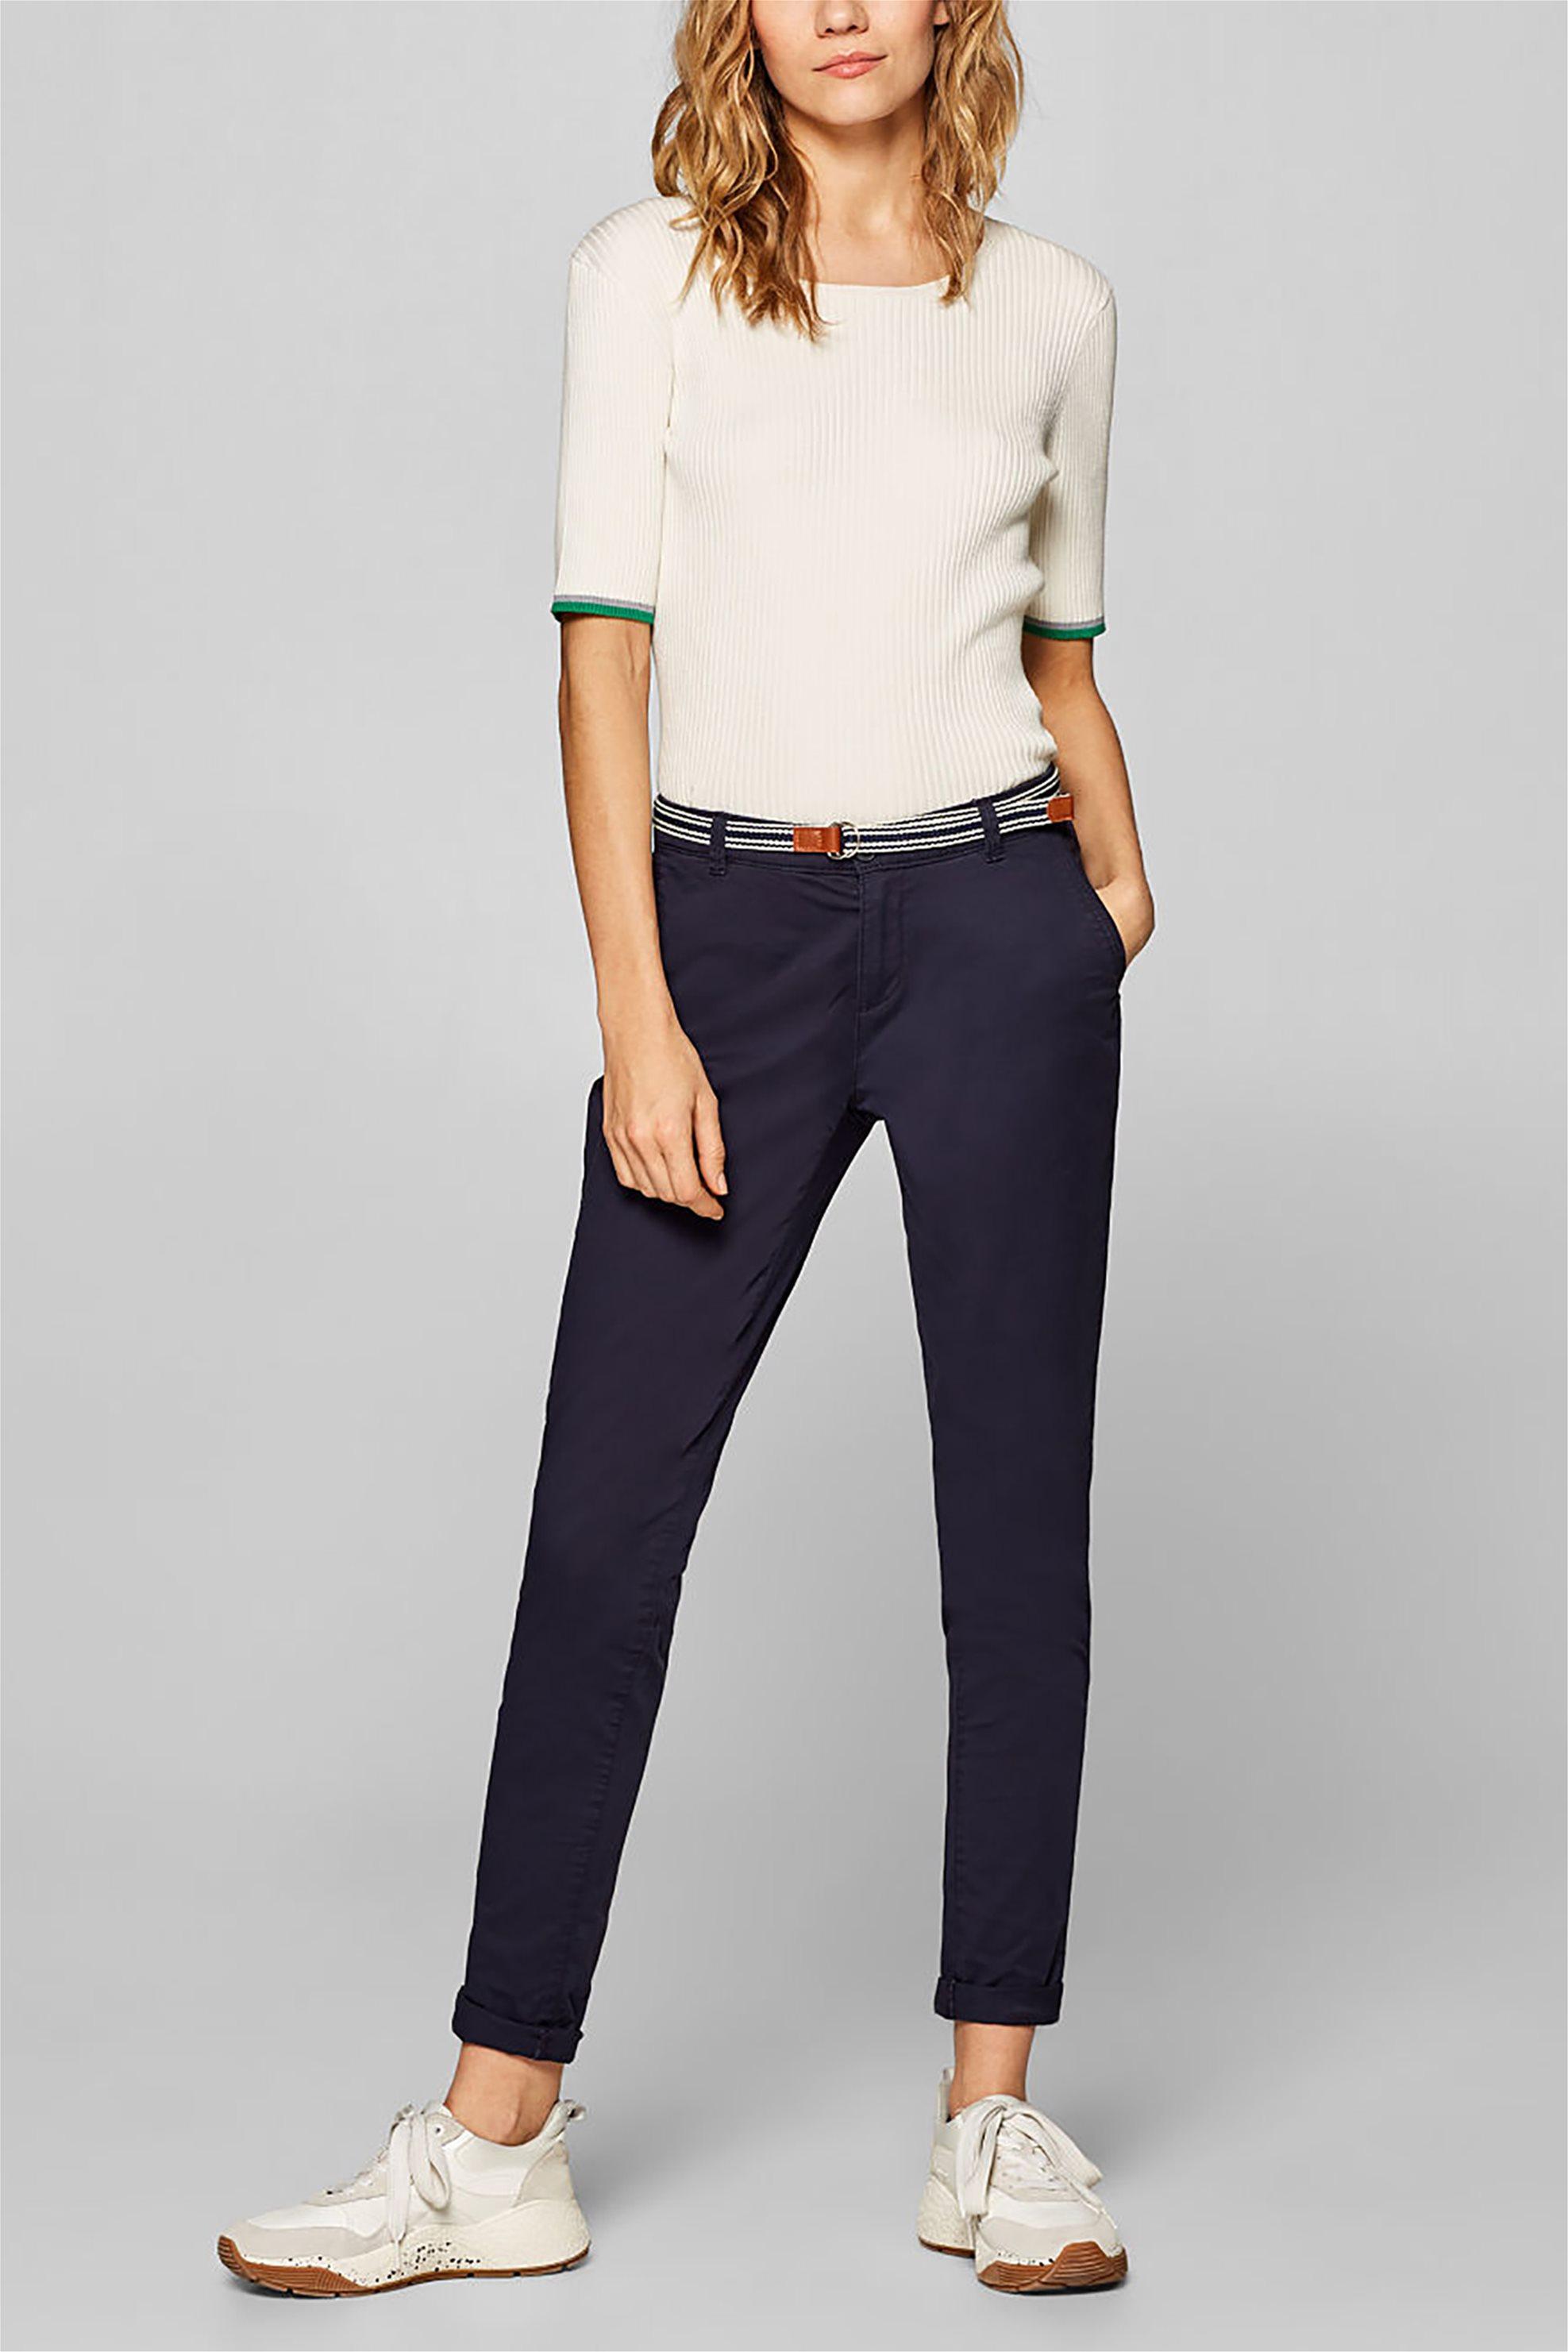 0cbbbef74cca Esprit γυναικείο chinos παντελόνι με ριγέ ζώνη - 999EE1B800 - Μπλε Σκούρο